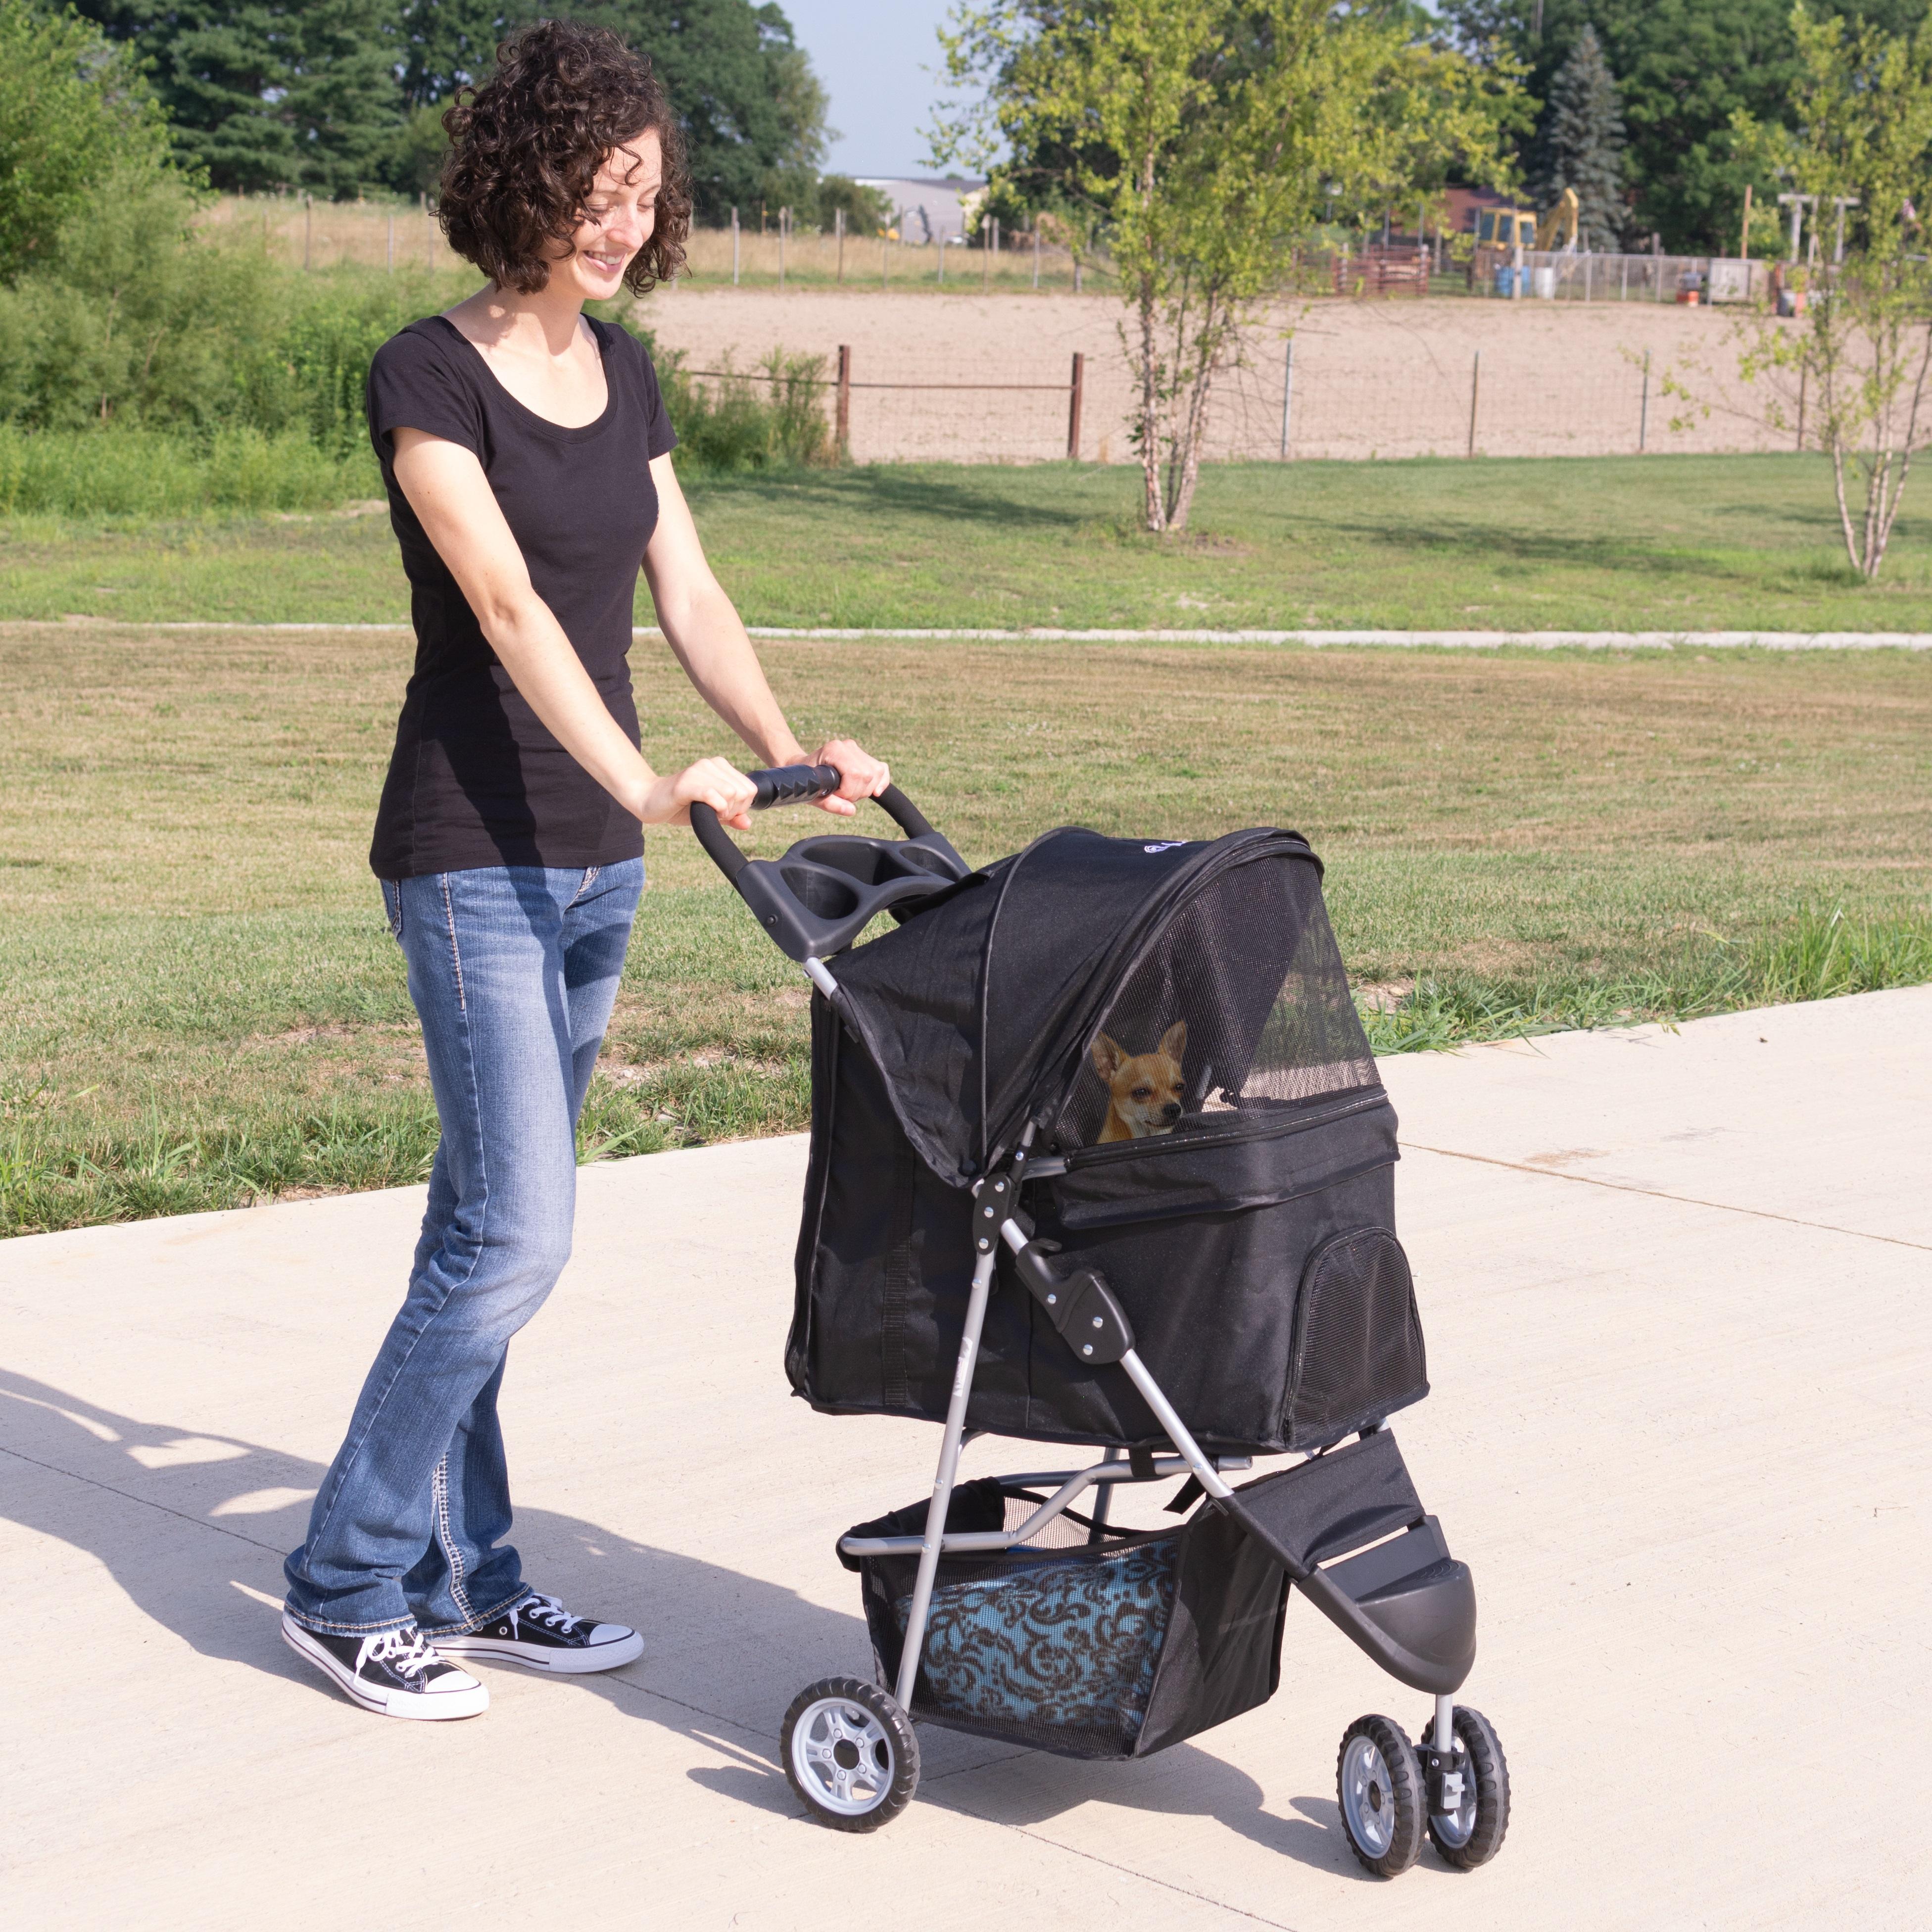 thumbnail 11 - VIVO Three Wheel Pet Stroller / Cat & Dog Foldable Carrier Strolling Cart